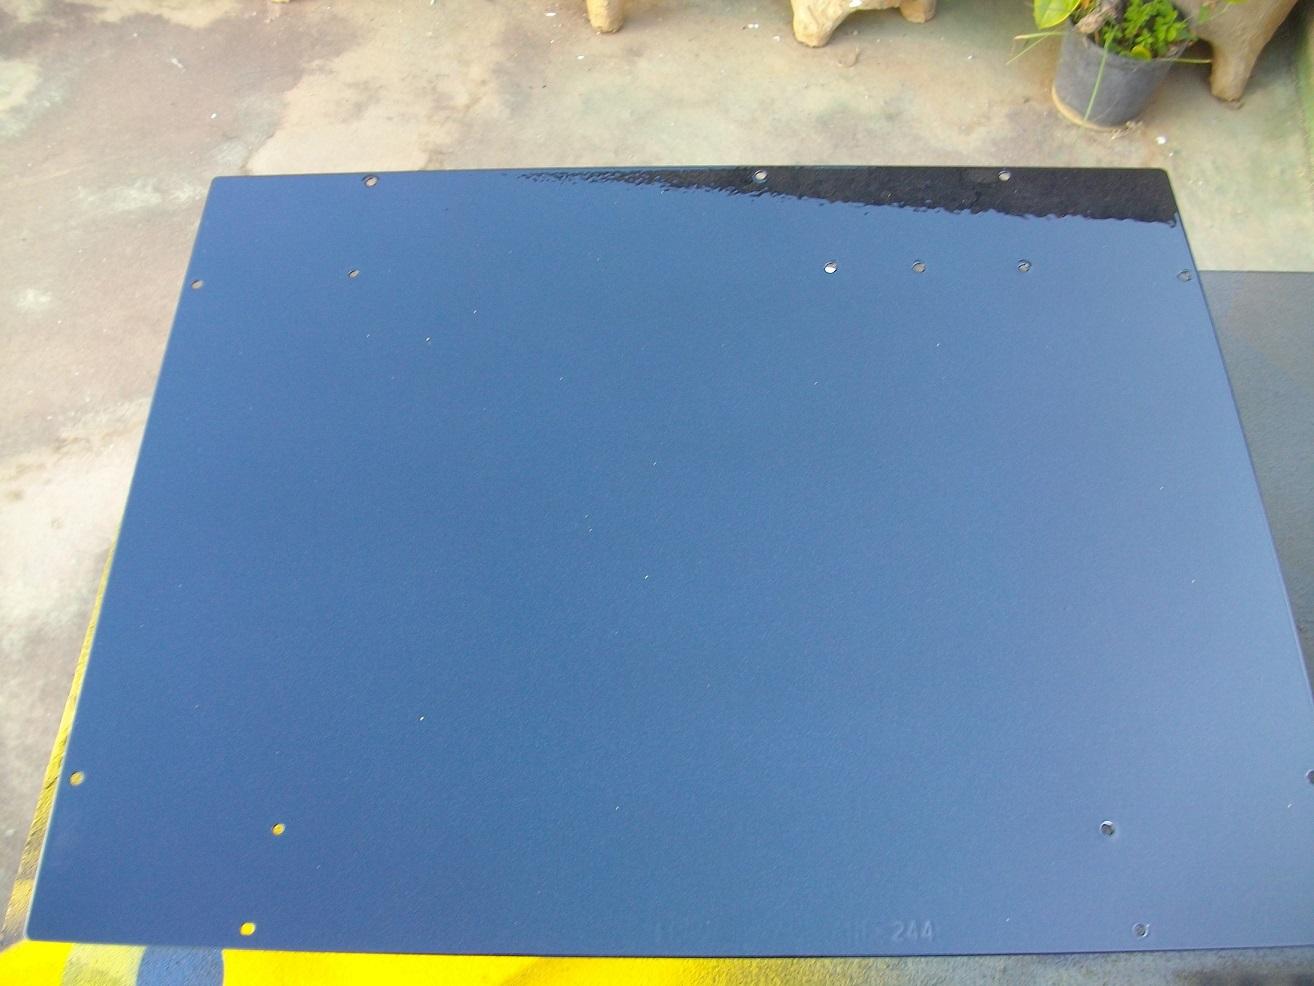 Mi Pioneer  serie azul - Página 2 S5e1xu